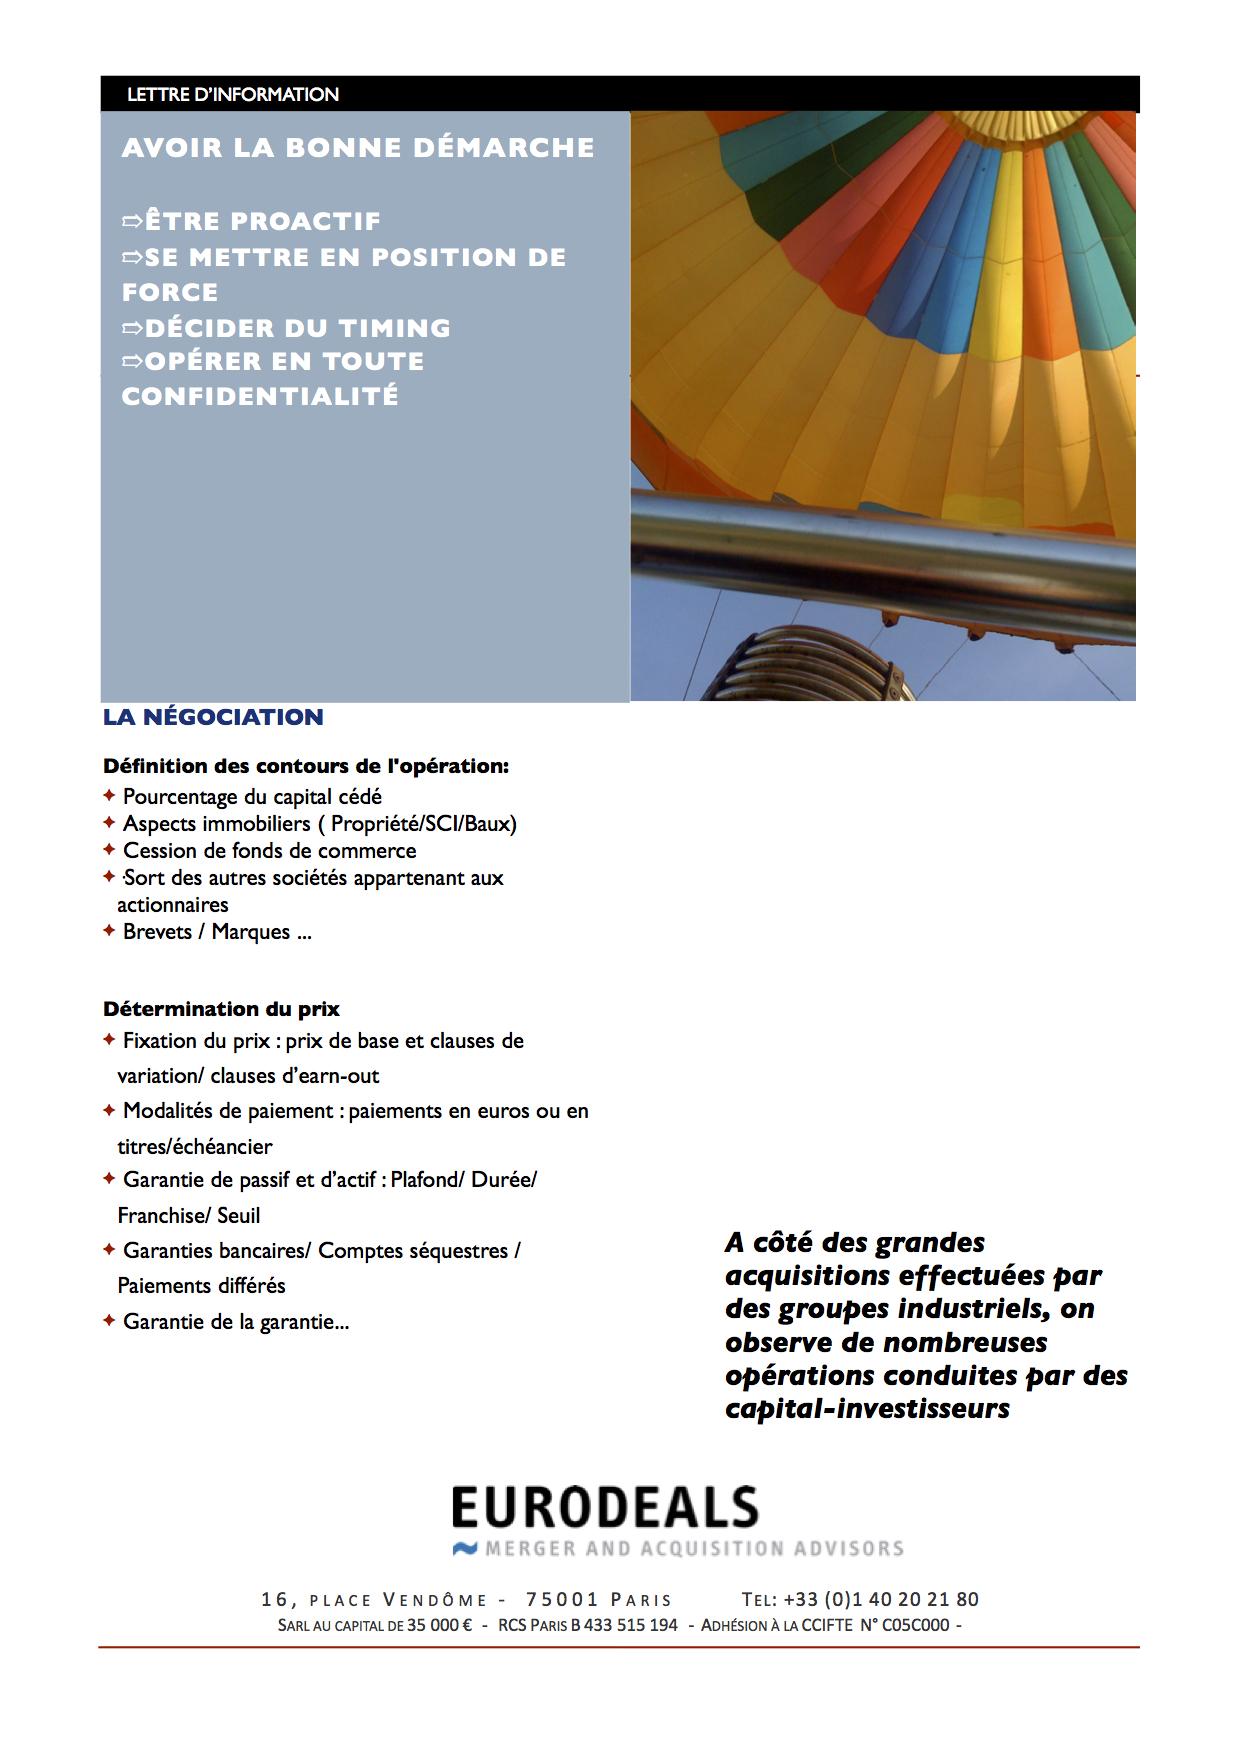 newsletter-eurodeals-comment-bien-ceder-son-entreprise-3